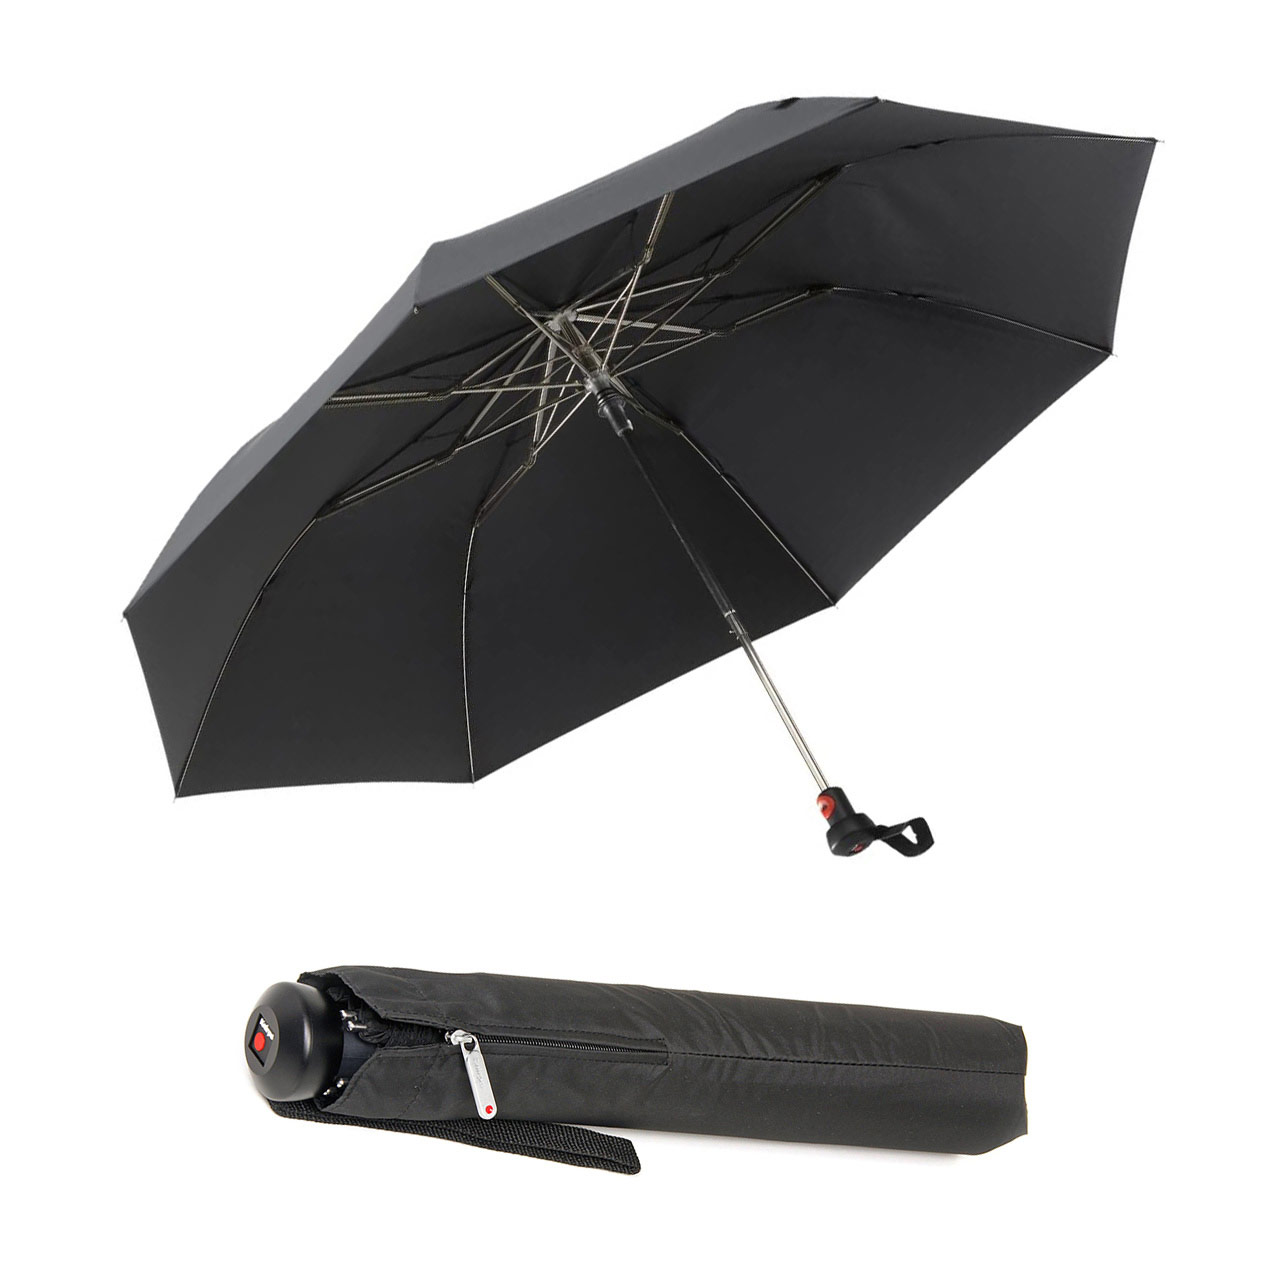 KNIRPS pocket umbrella Topmatic SL 826 Black   the design gift shop